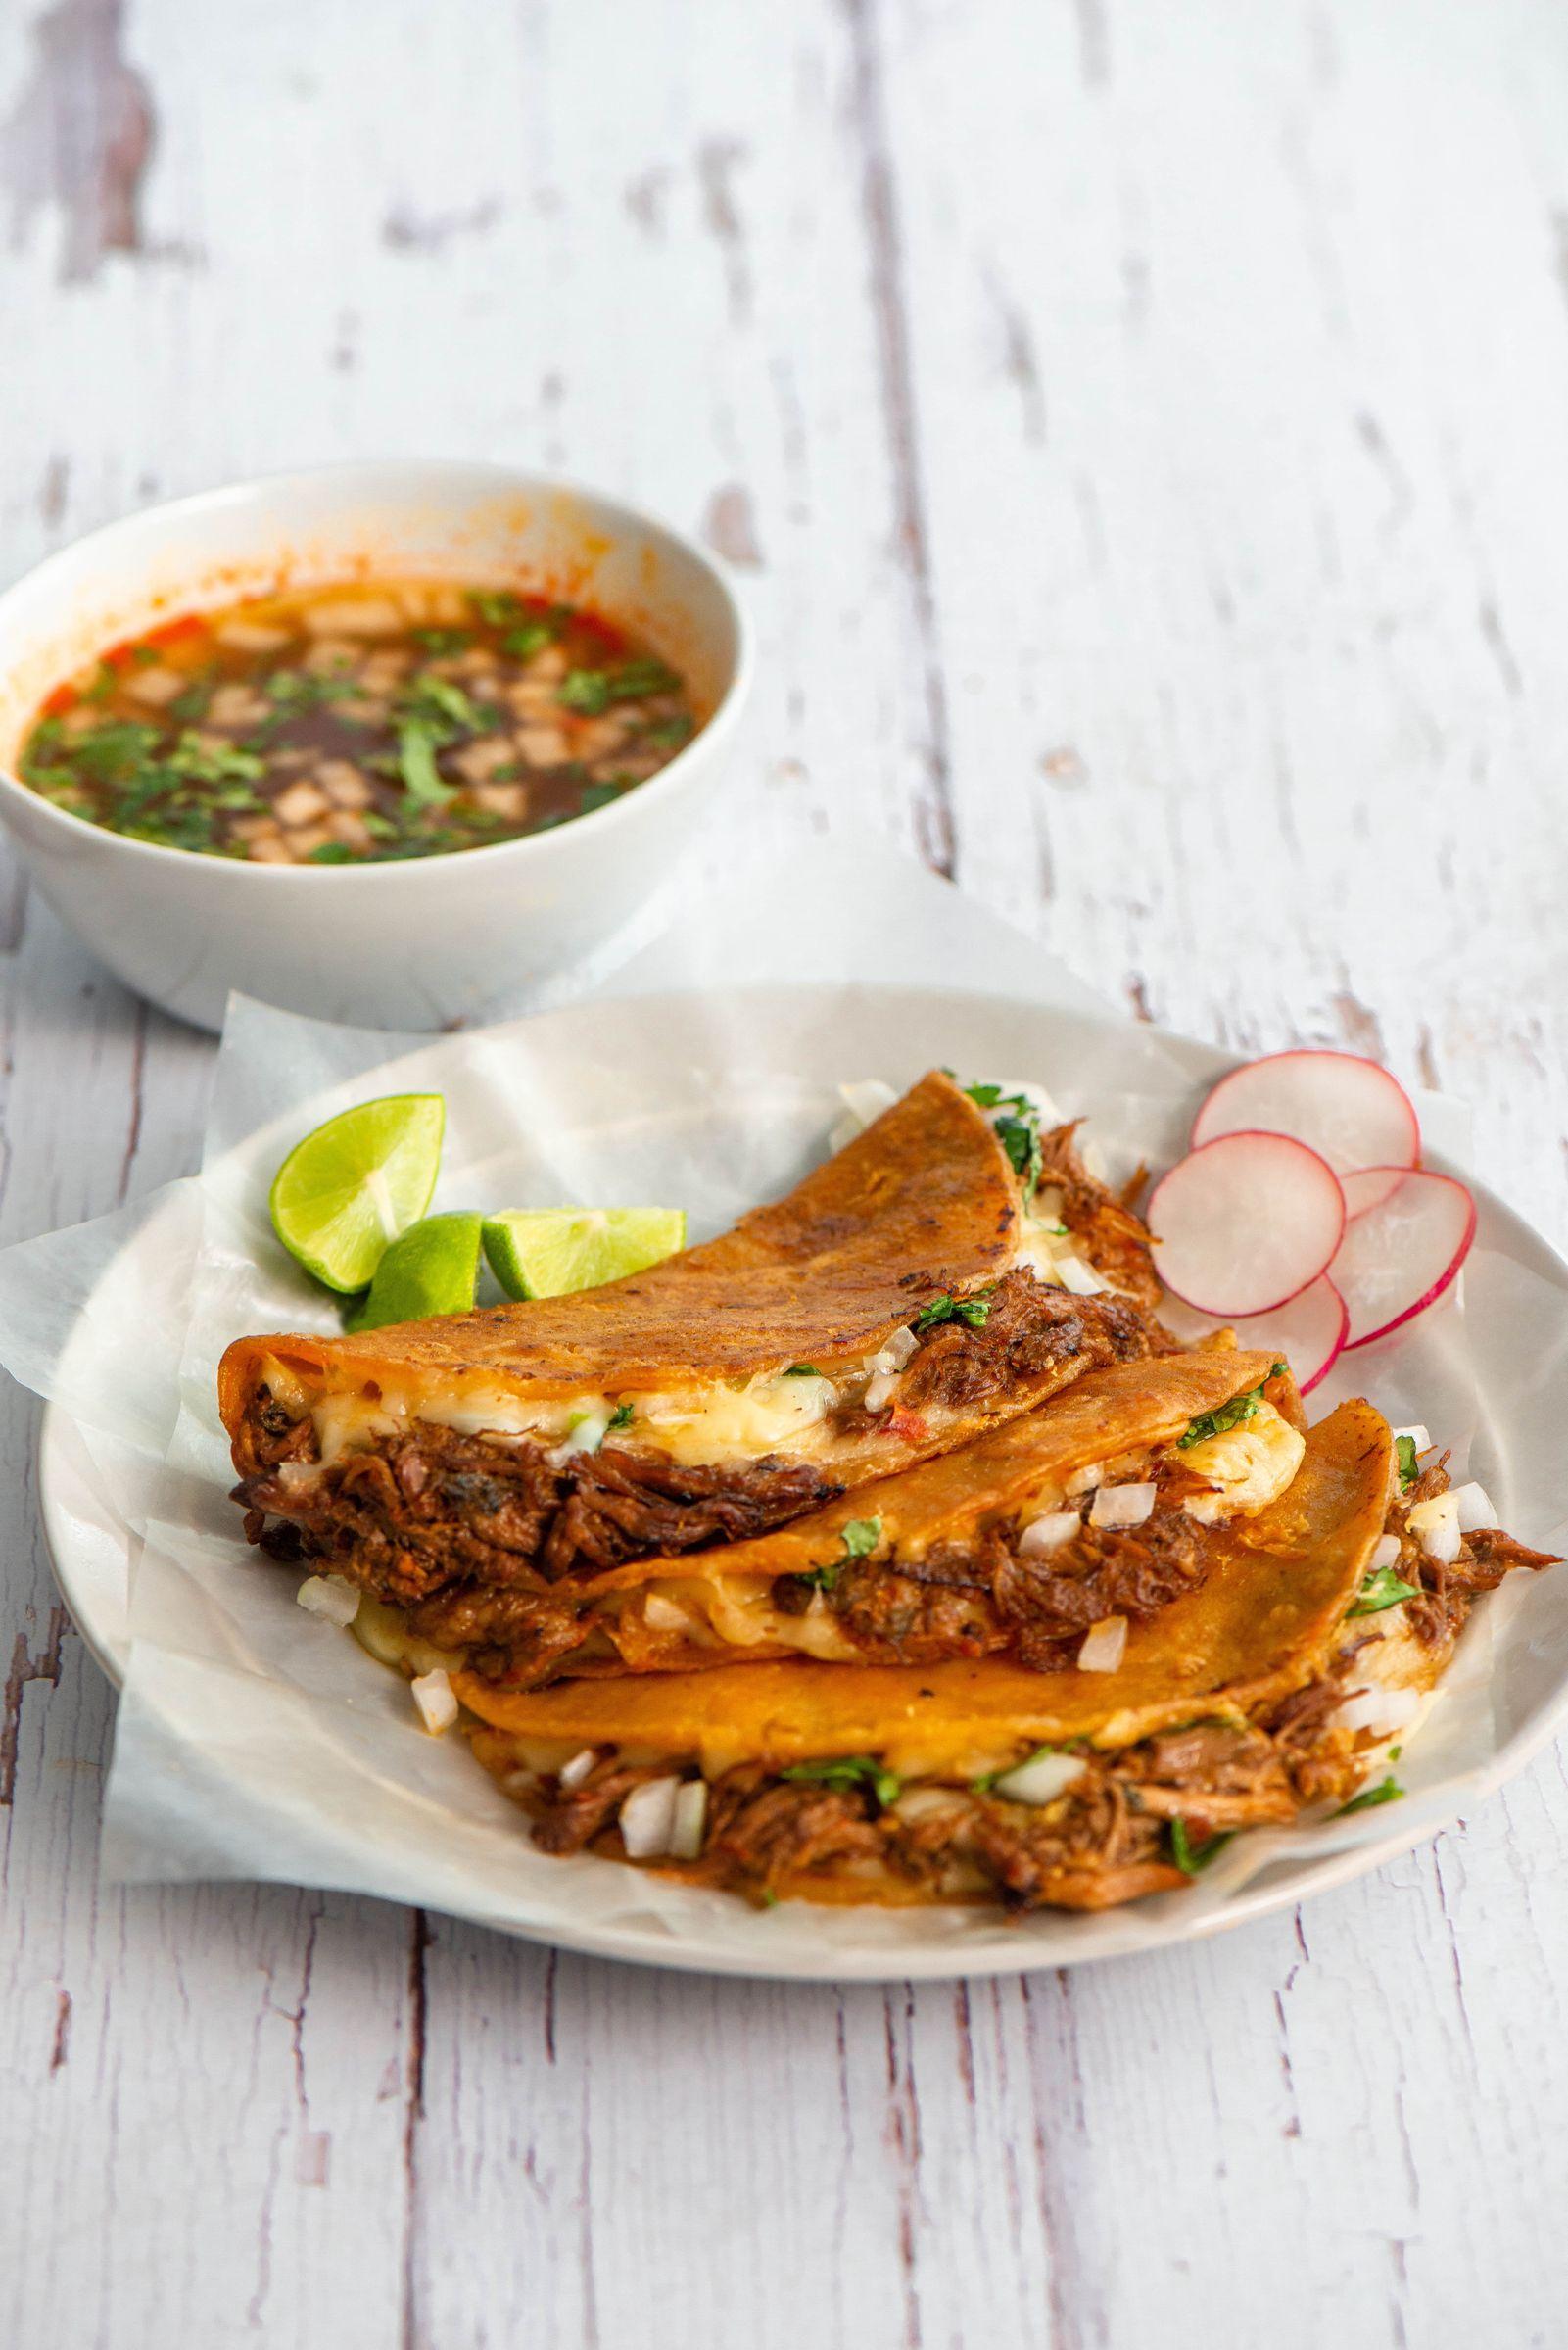 California Quesabirria Beef Tacos